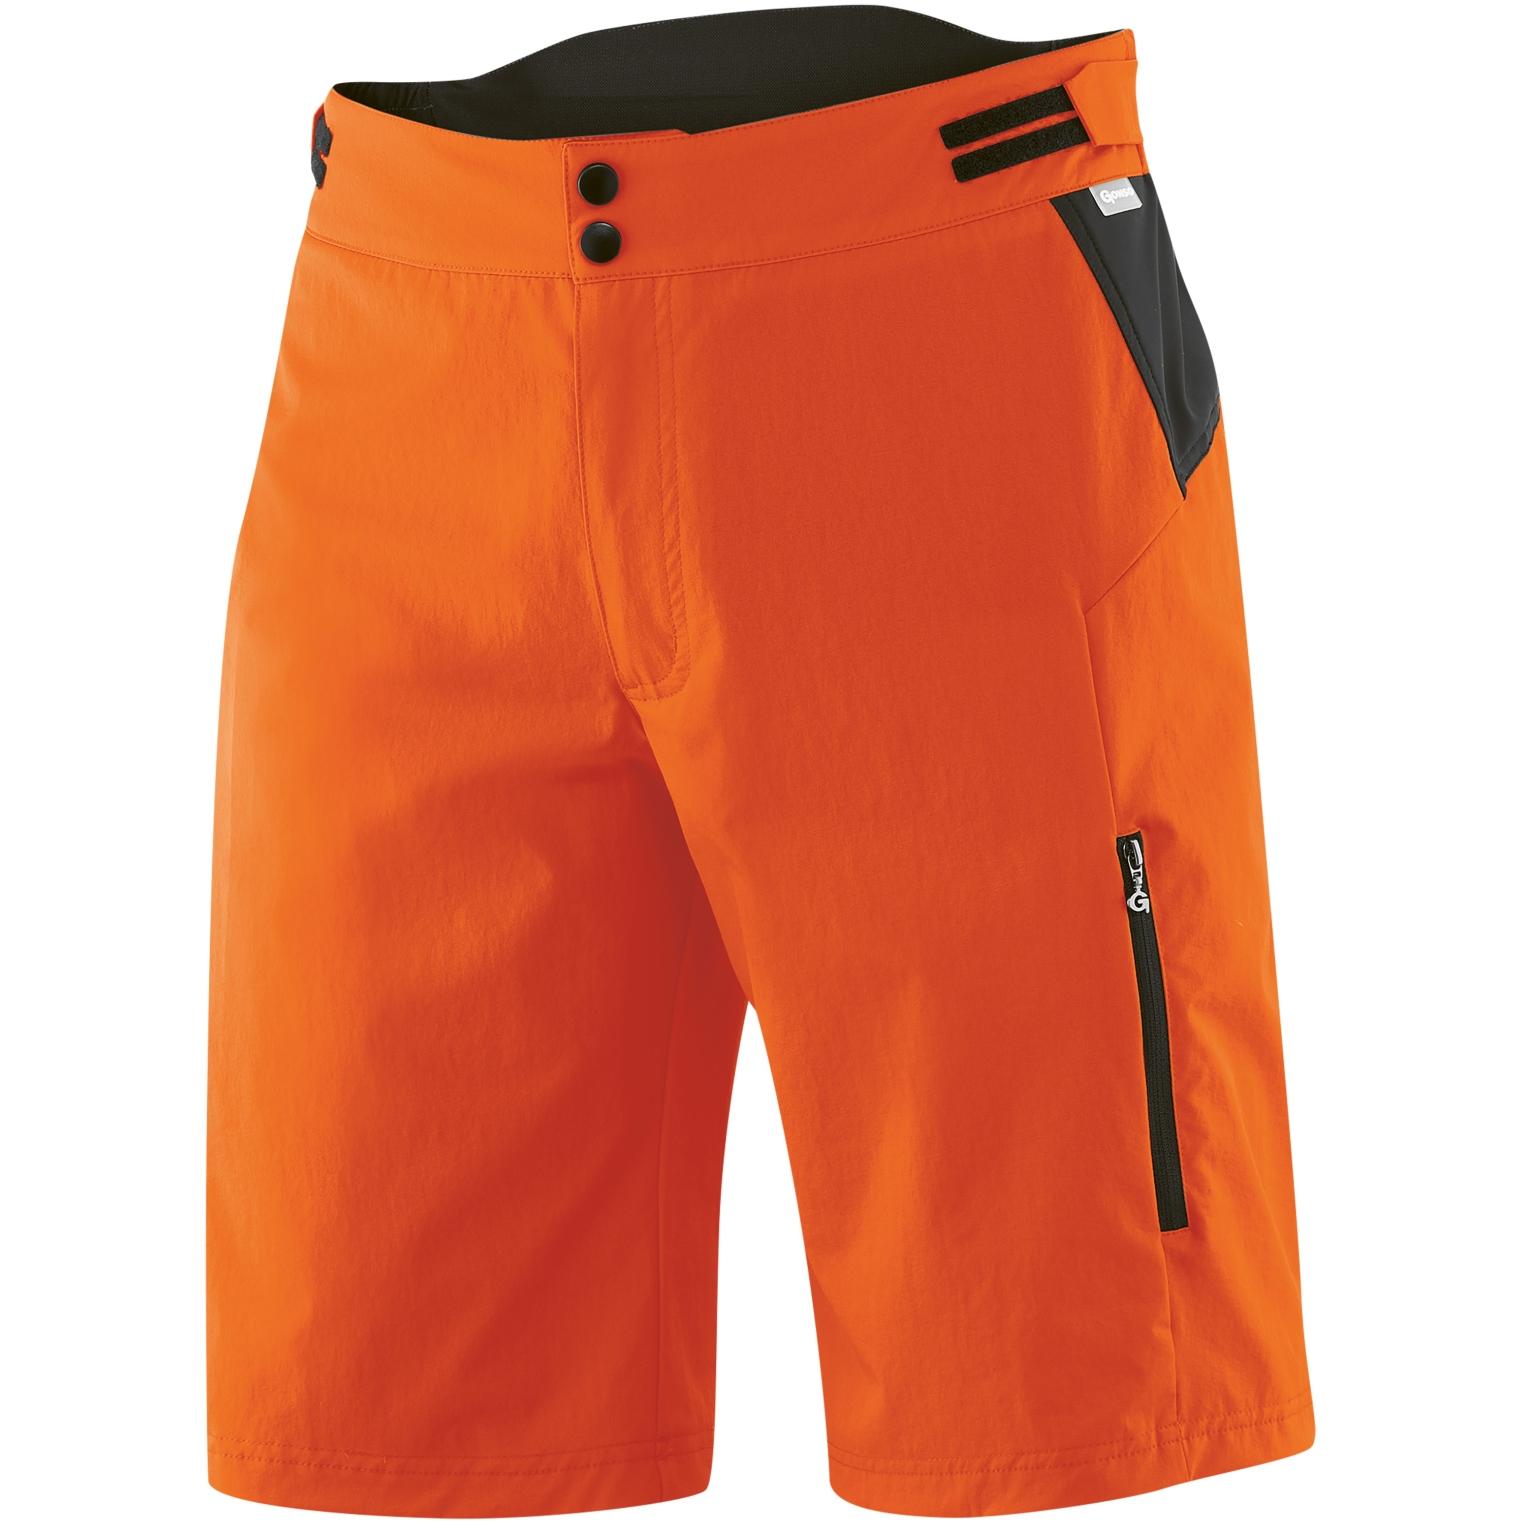 Gonso Buet Men's Bike Shorts - mandarin red